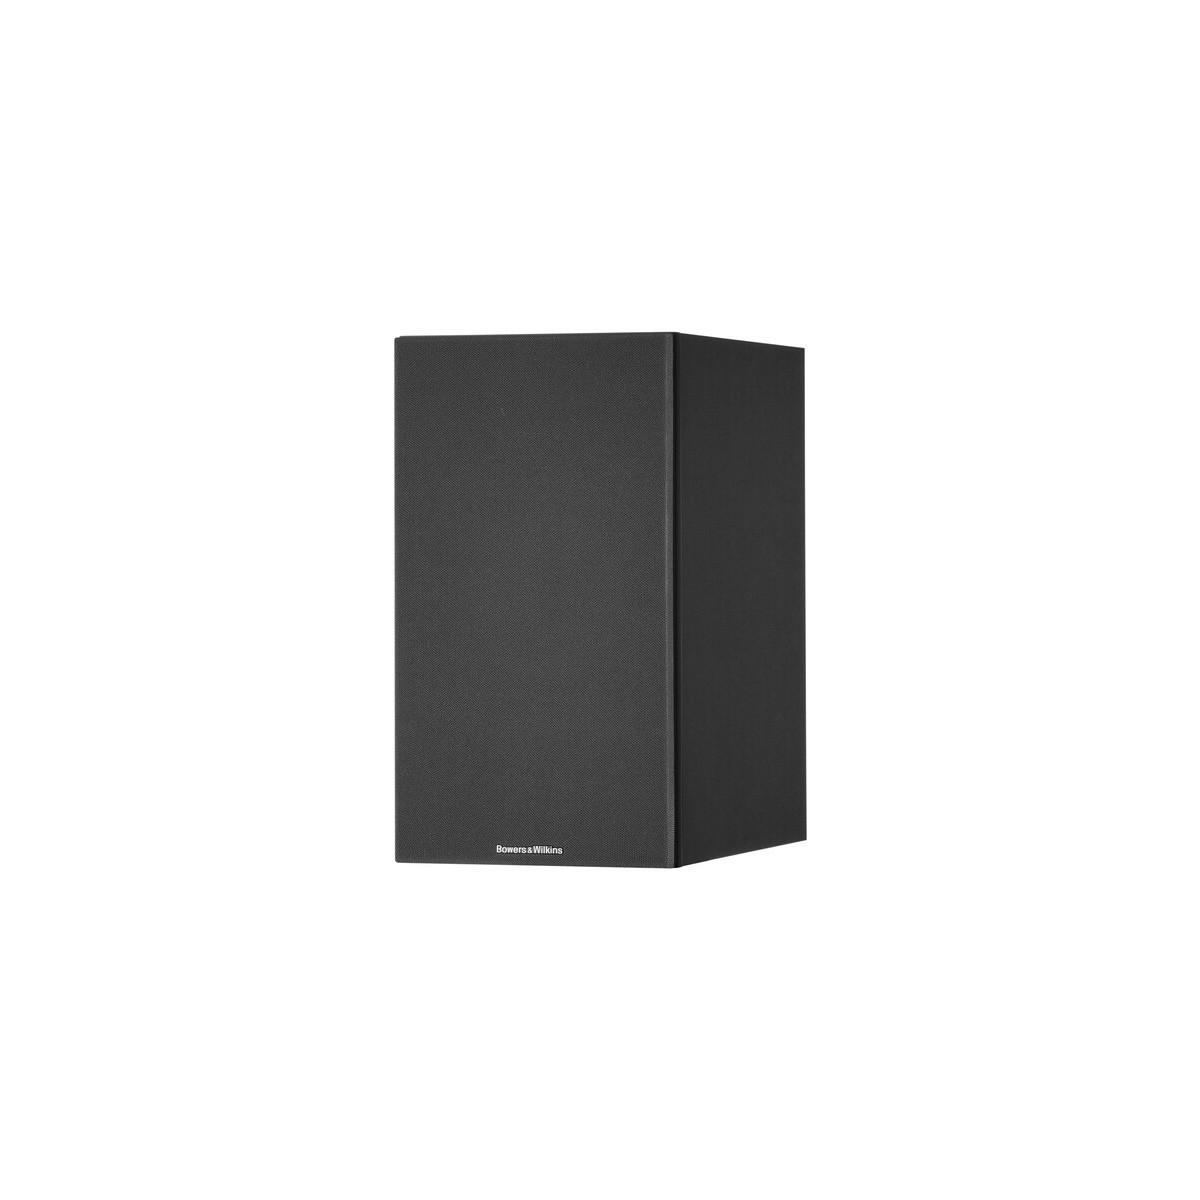 Kompaktlautsprecher B&W 606 S2 Anniversary Edition (Paarpreis)